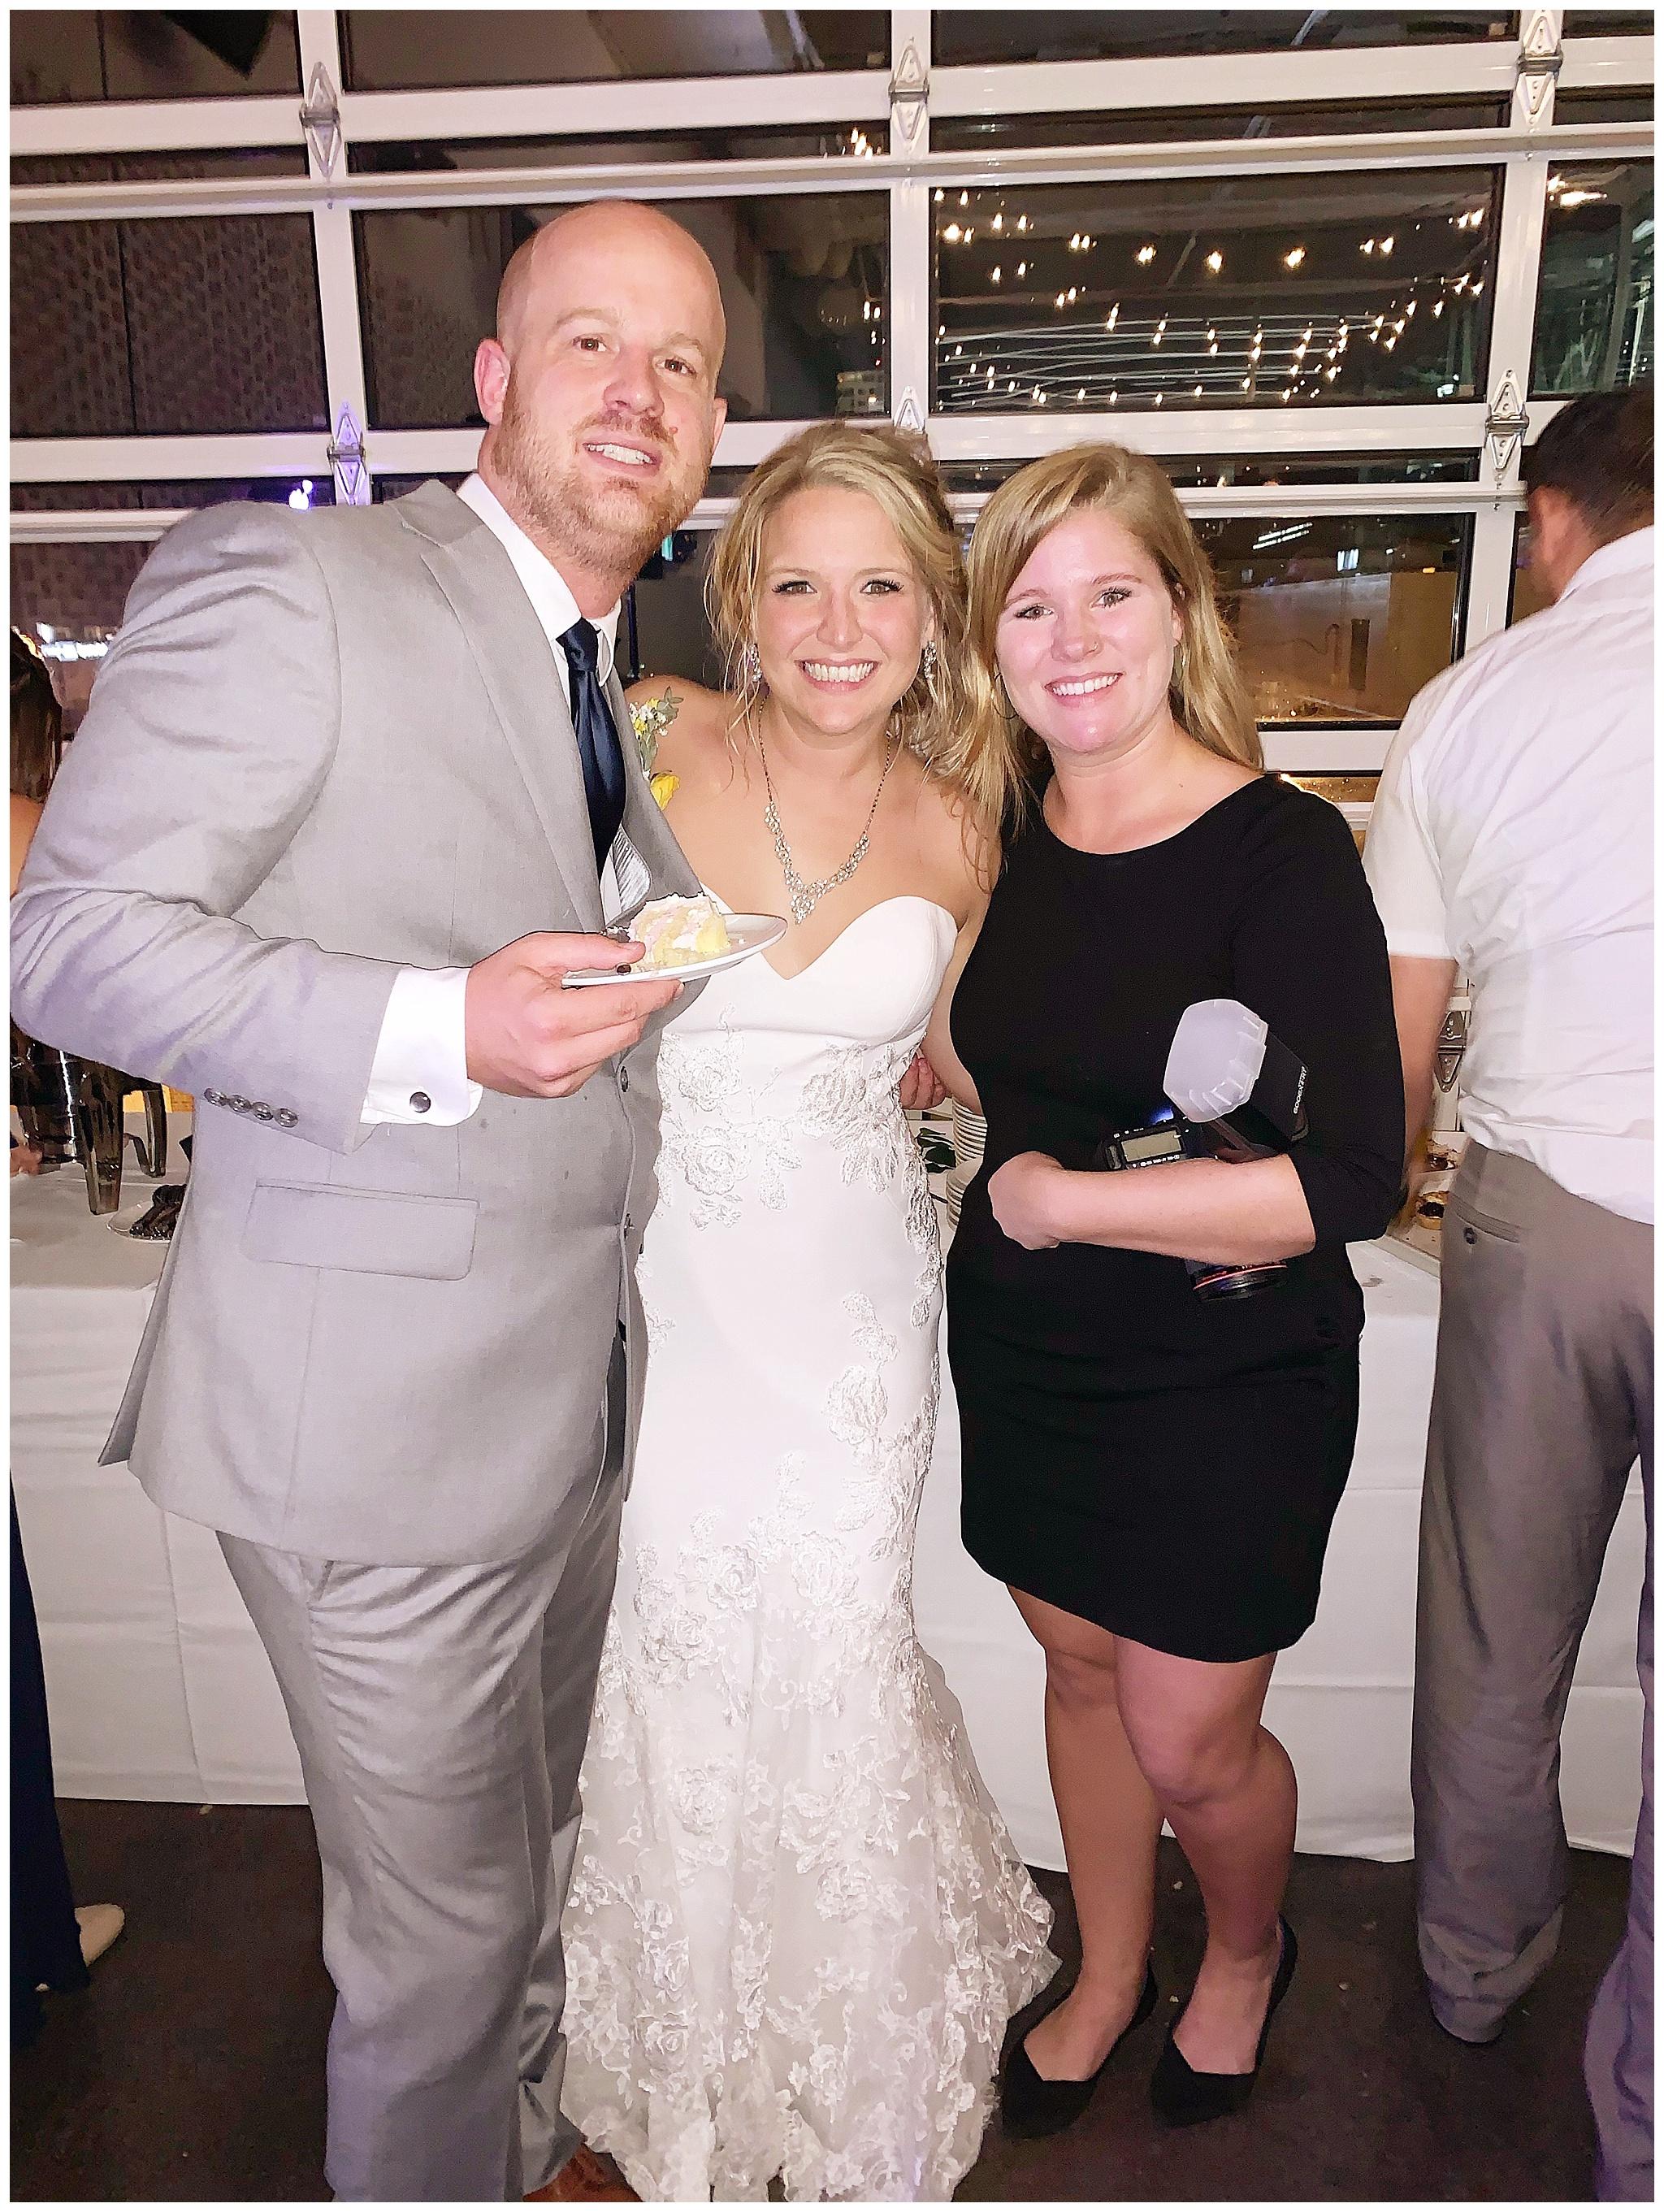 Venue_at_Milwaukee_Brewing_Company_wedding_milwaukee_wisconsin_0405.jpg